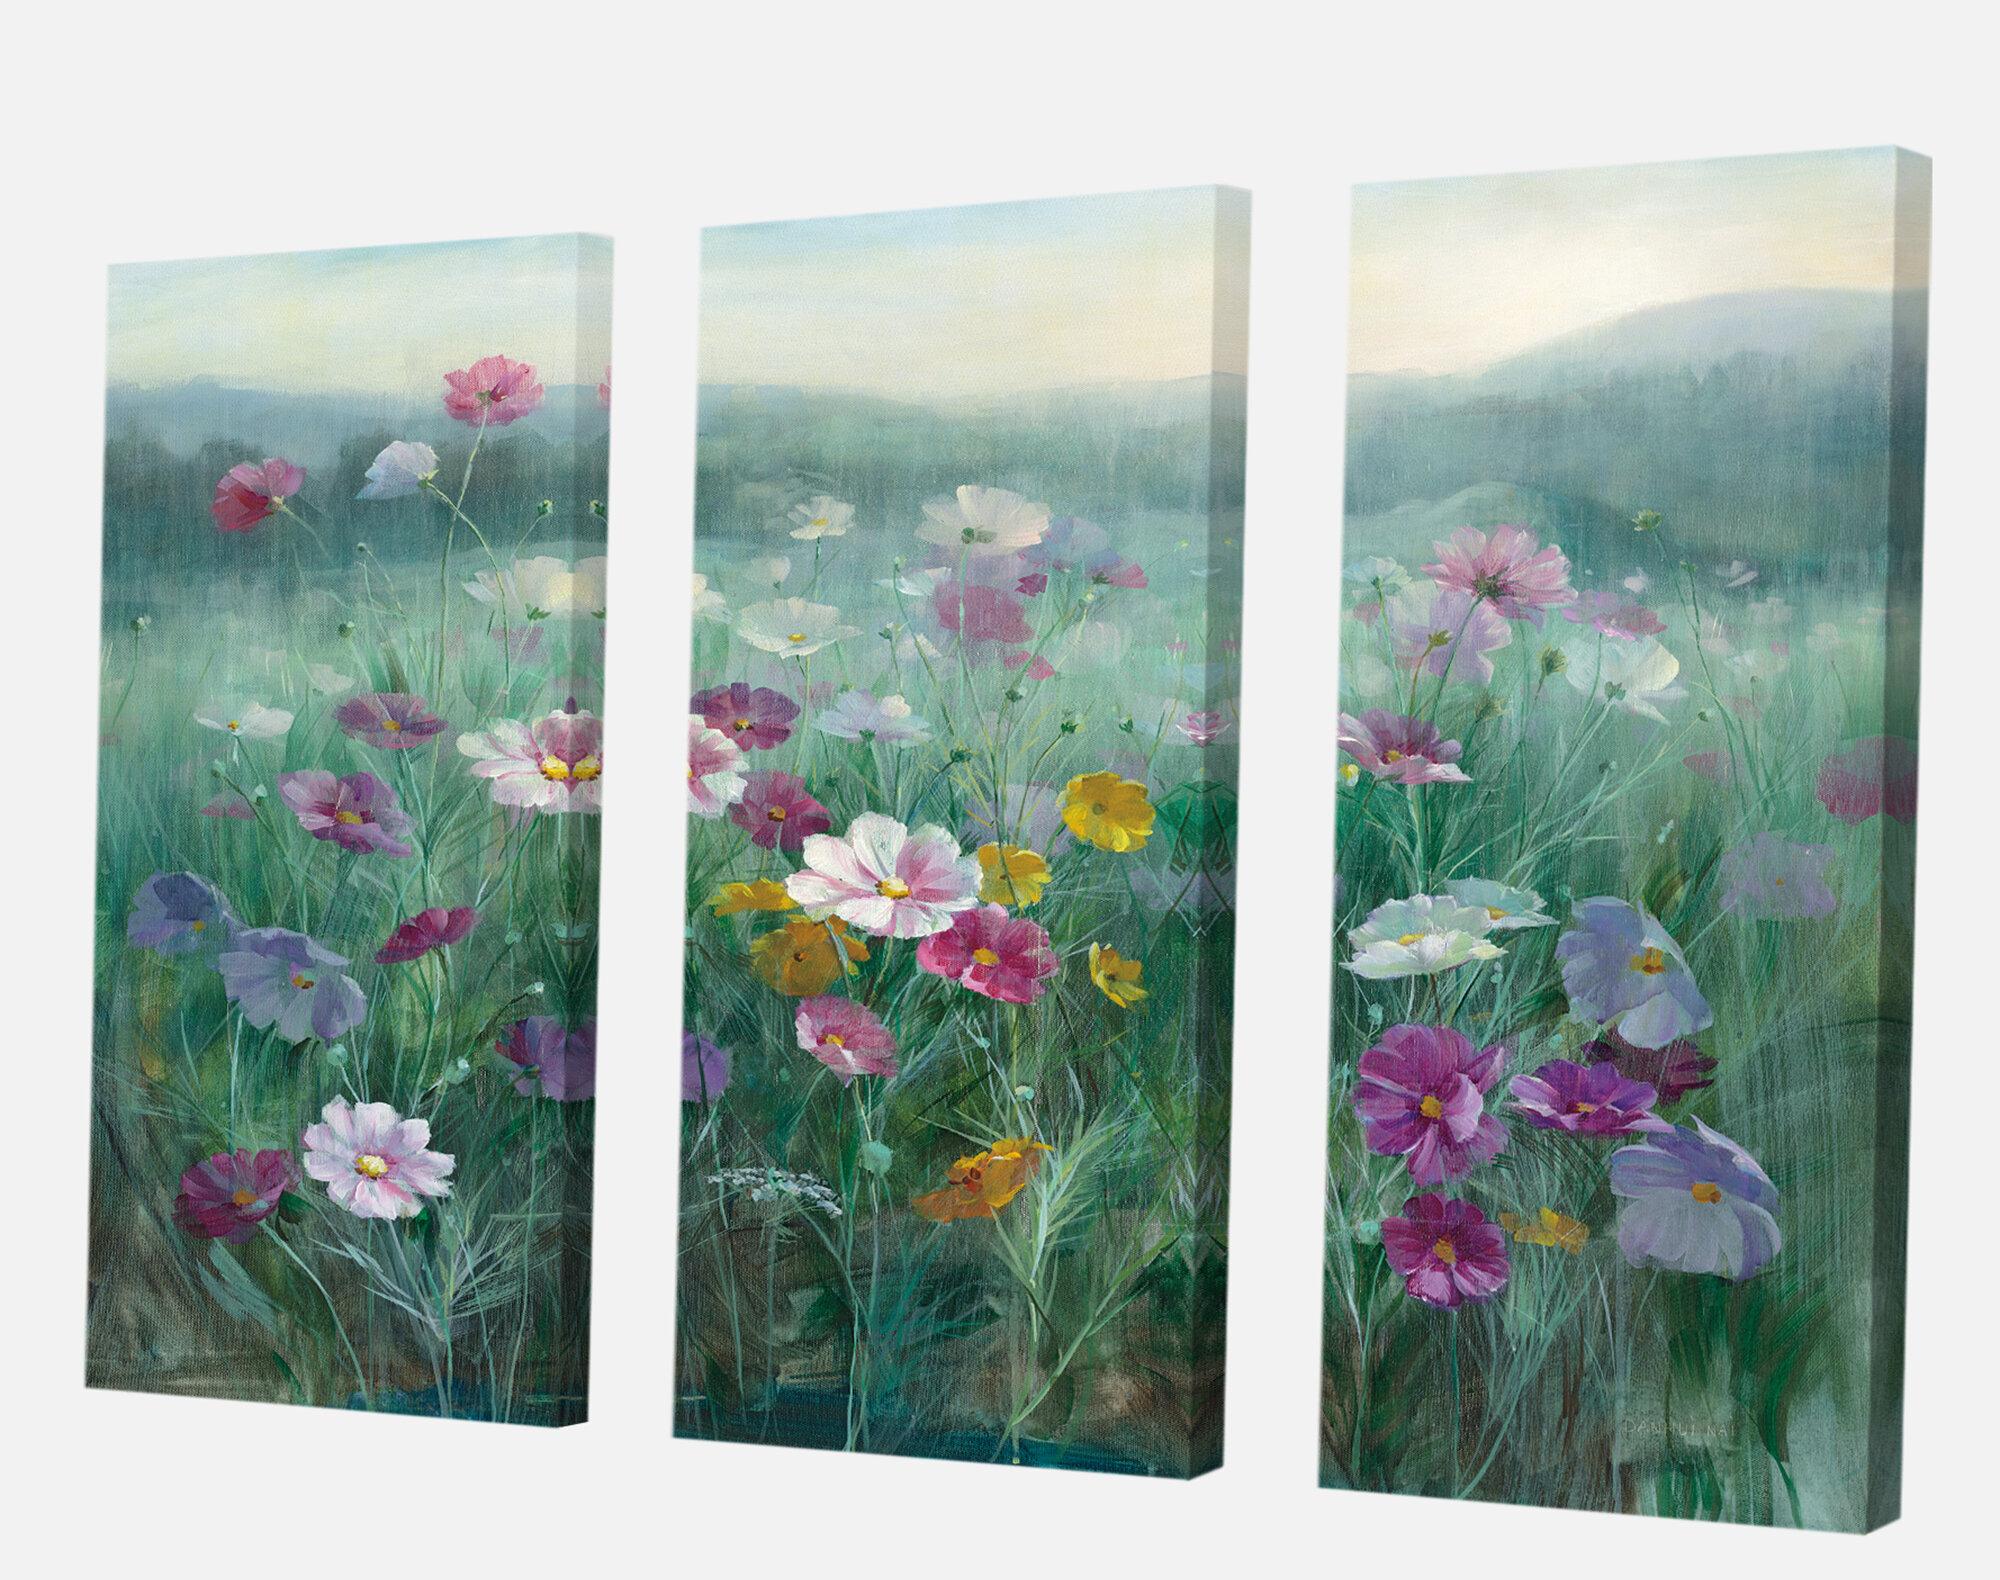 East Urban Home Farmhouse Premium Flower Field Painting Multi Piece Image On Canvas Wayfair